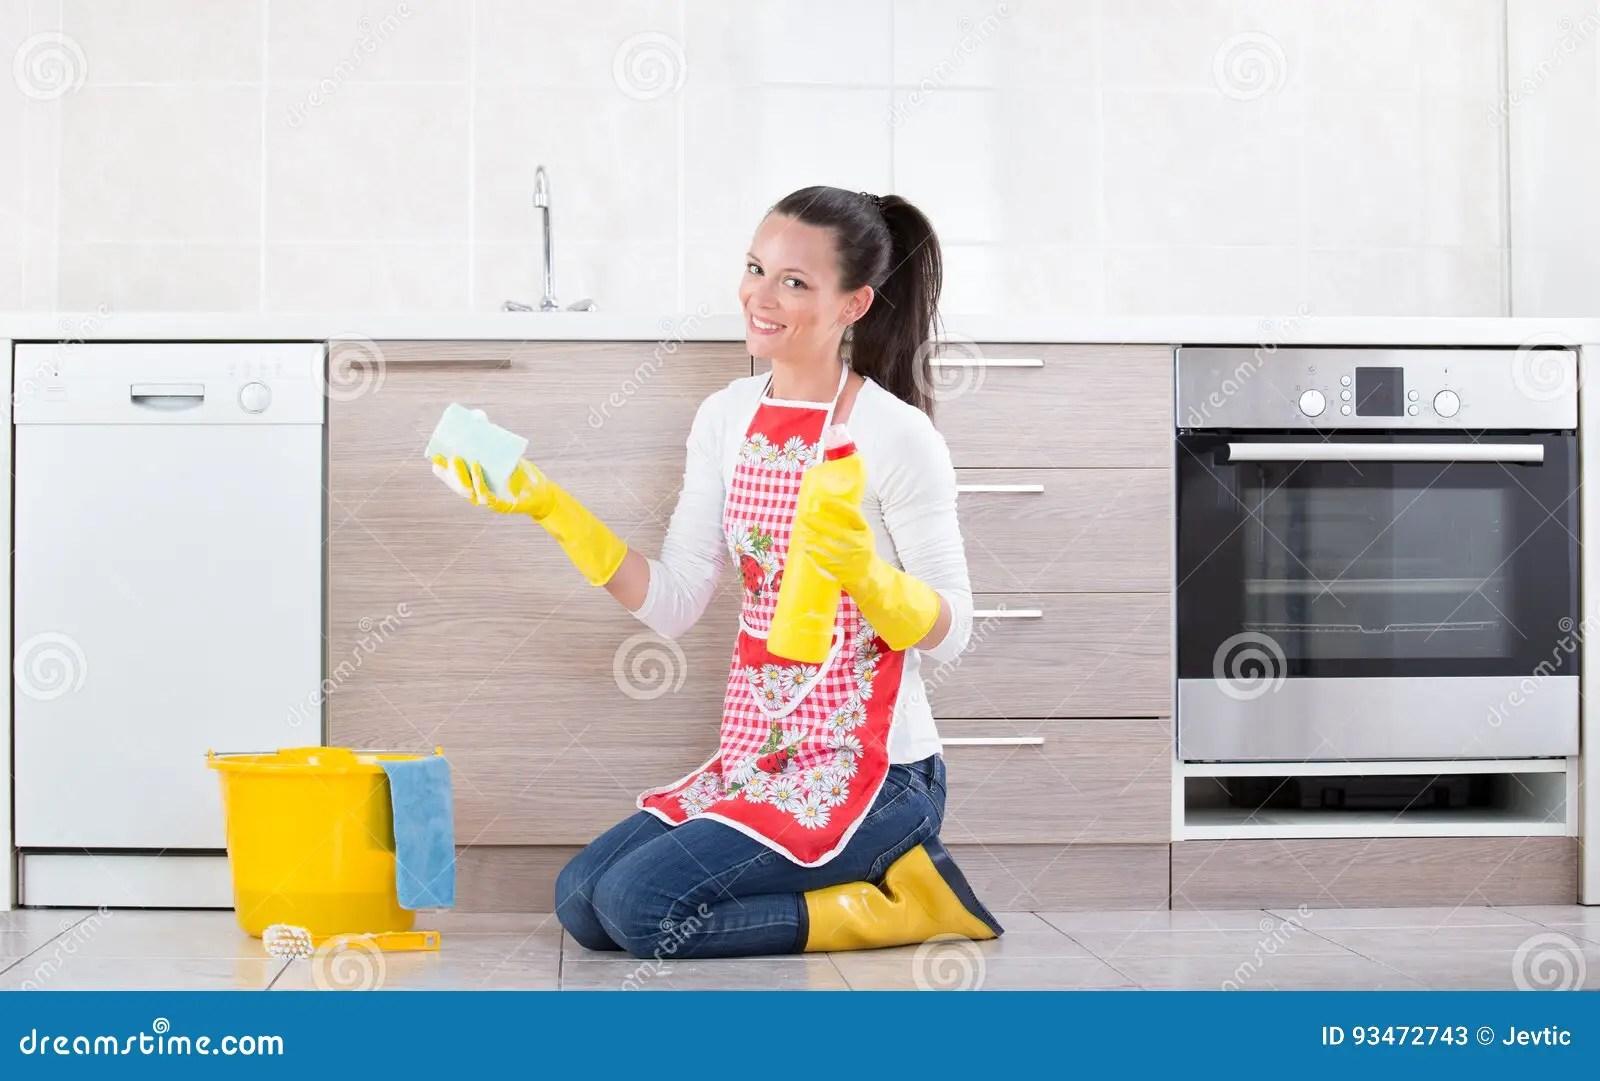 cleaning kitchen floors sink base cabinet with drawers 妇女清洁厨房地板库存图片 图片包括有房子 楼层 泡沫 成人 卫生学 妇女清洁厨房地板